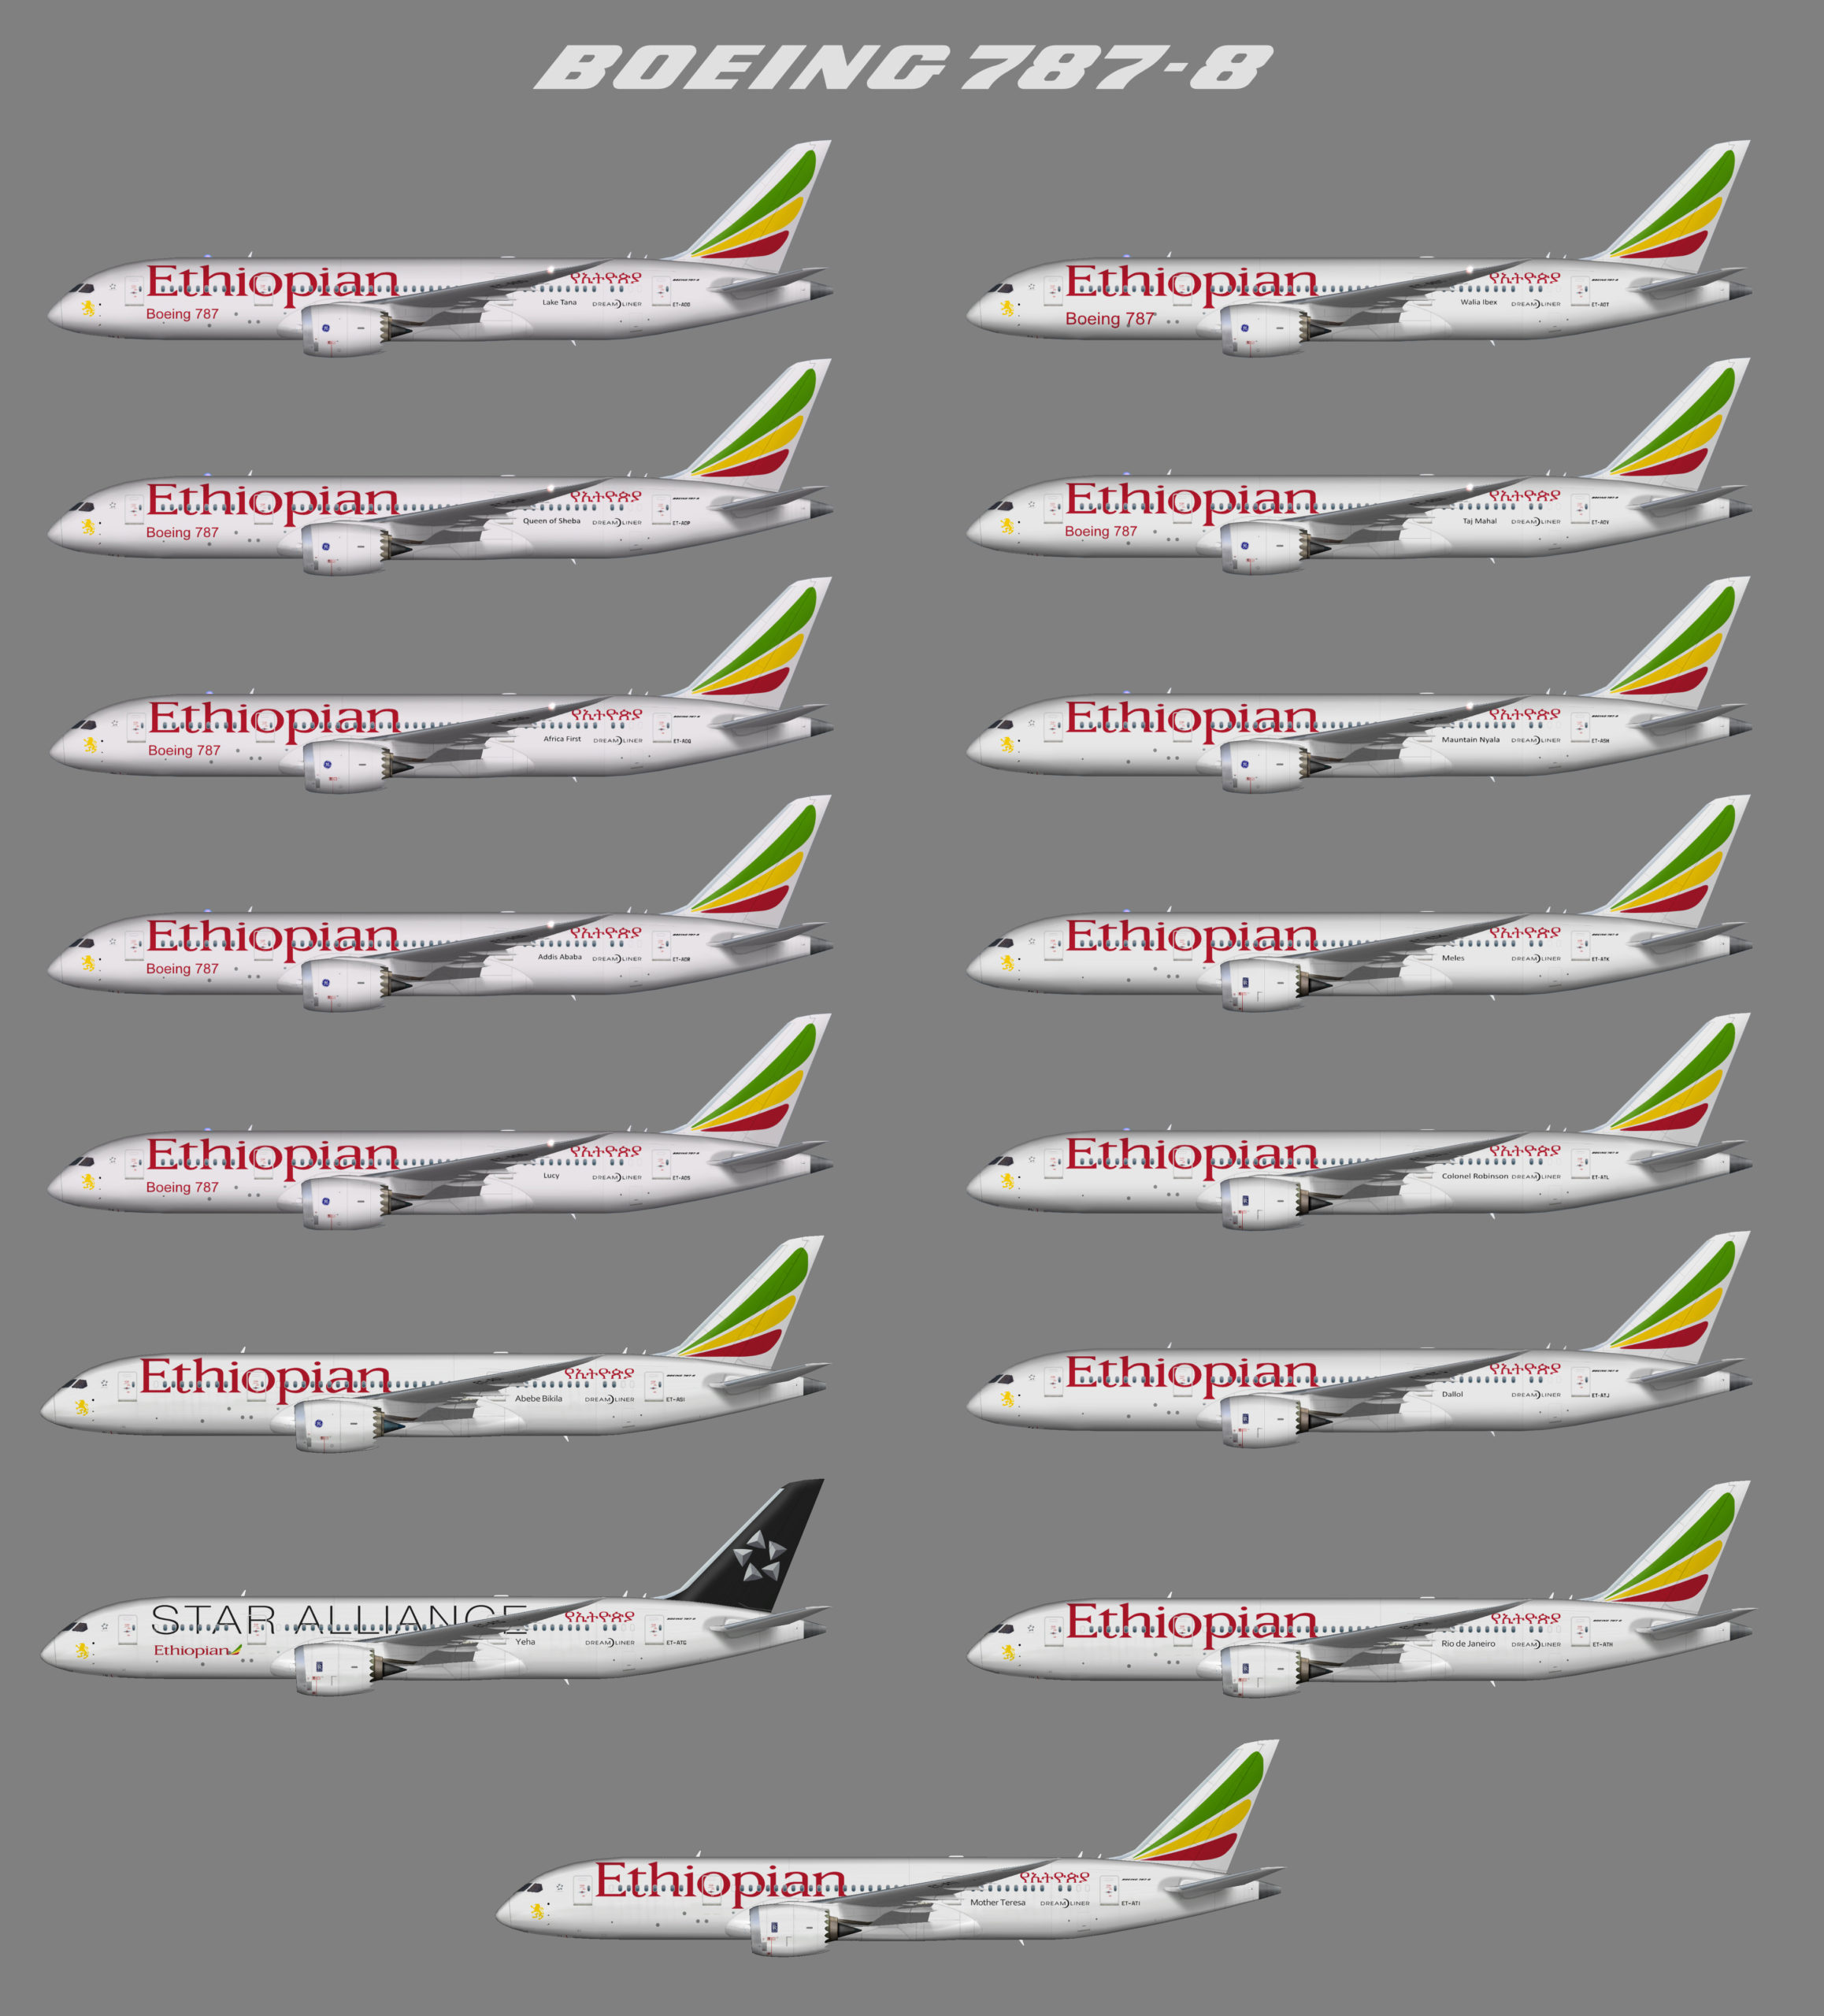 FSP Ethiopian Airlines Boeing 787-8